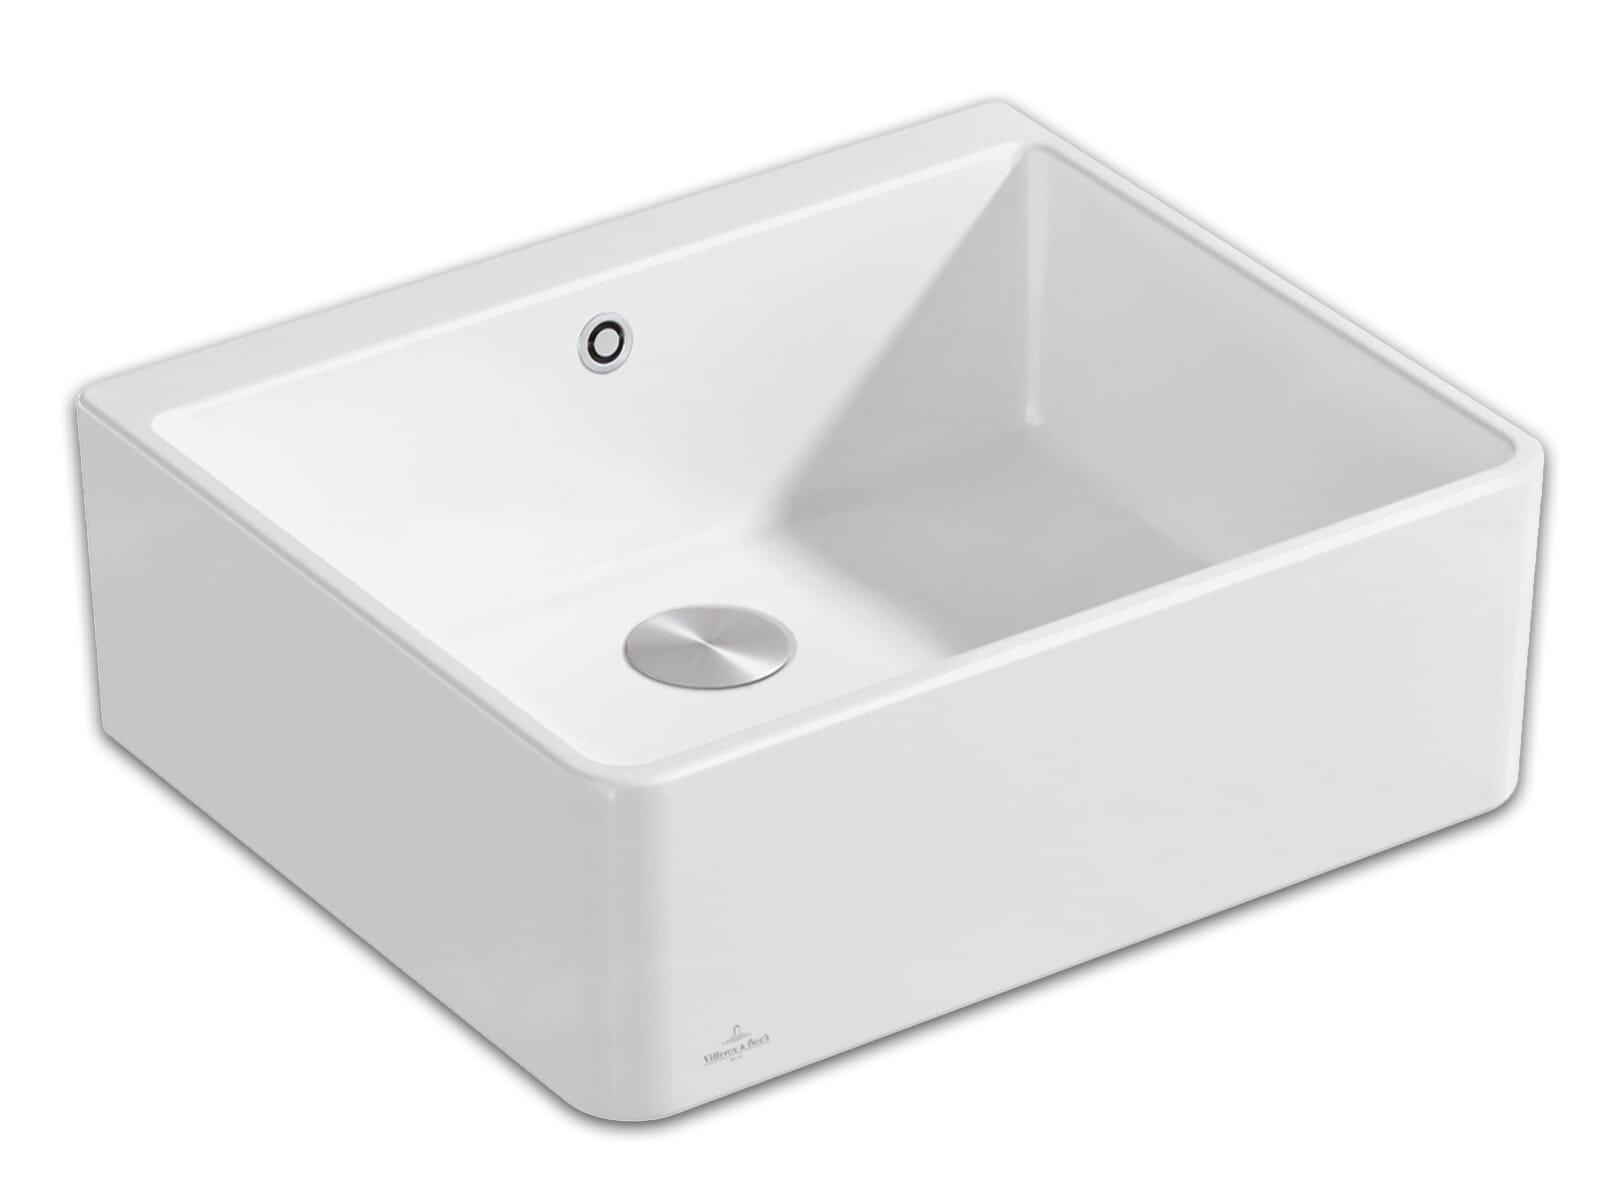 Villeroy & Boch Spülstein 60 X - 6360 01 R1 Weiß (alpin) Keramikspüle Handbetätigung